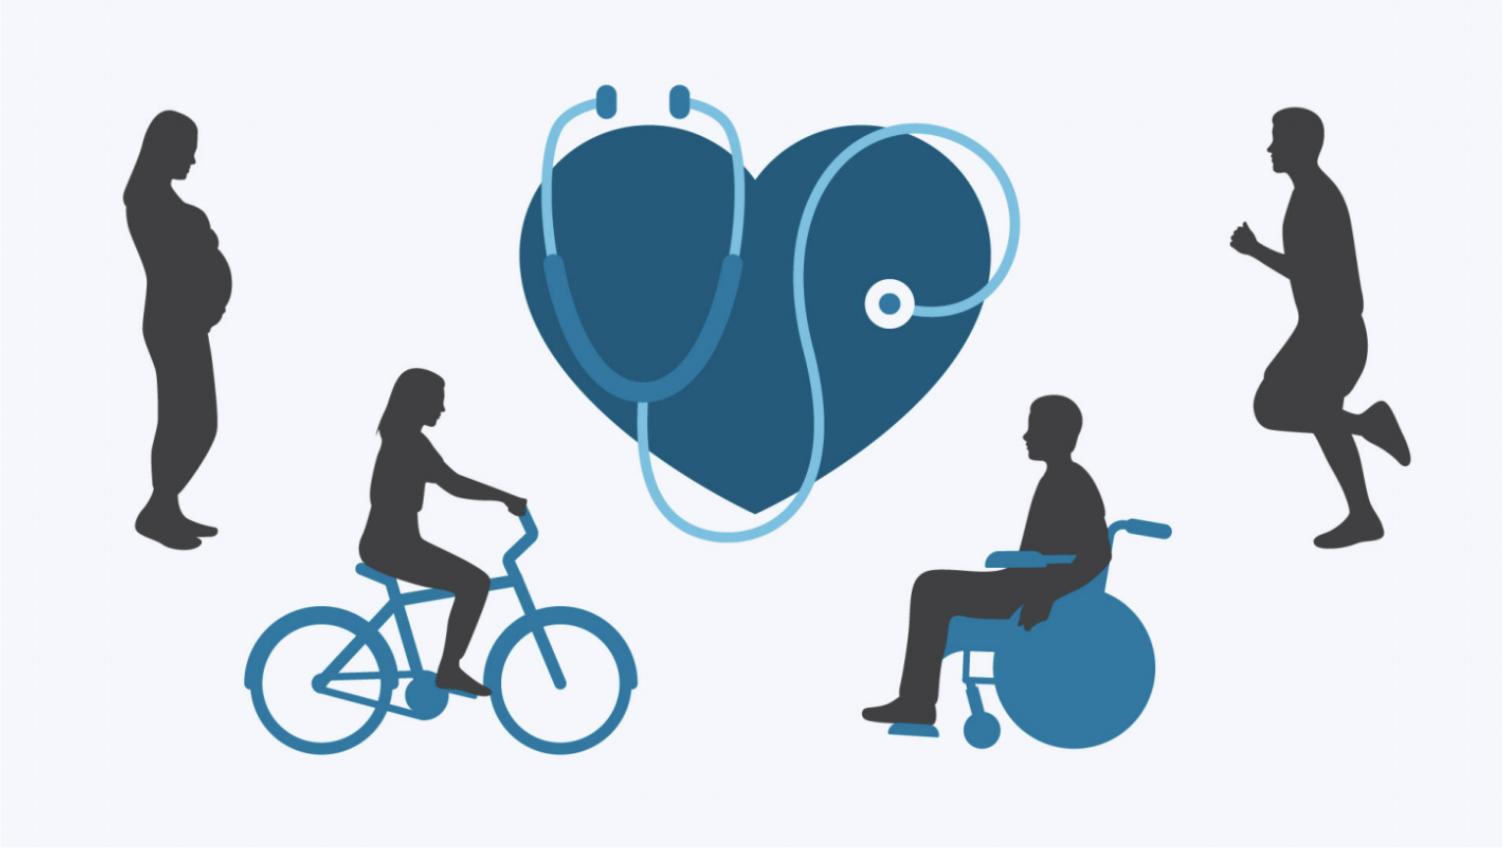 Main-line-health virtual event series custom websites